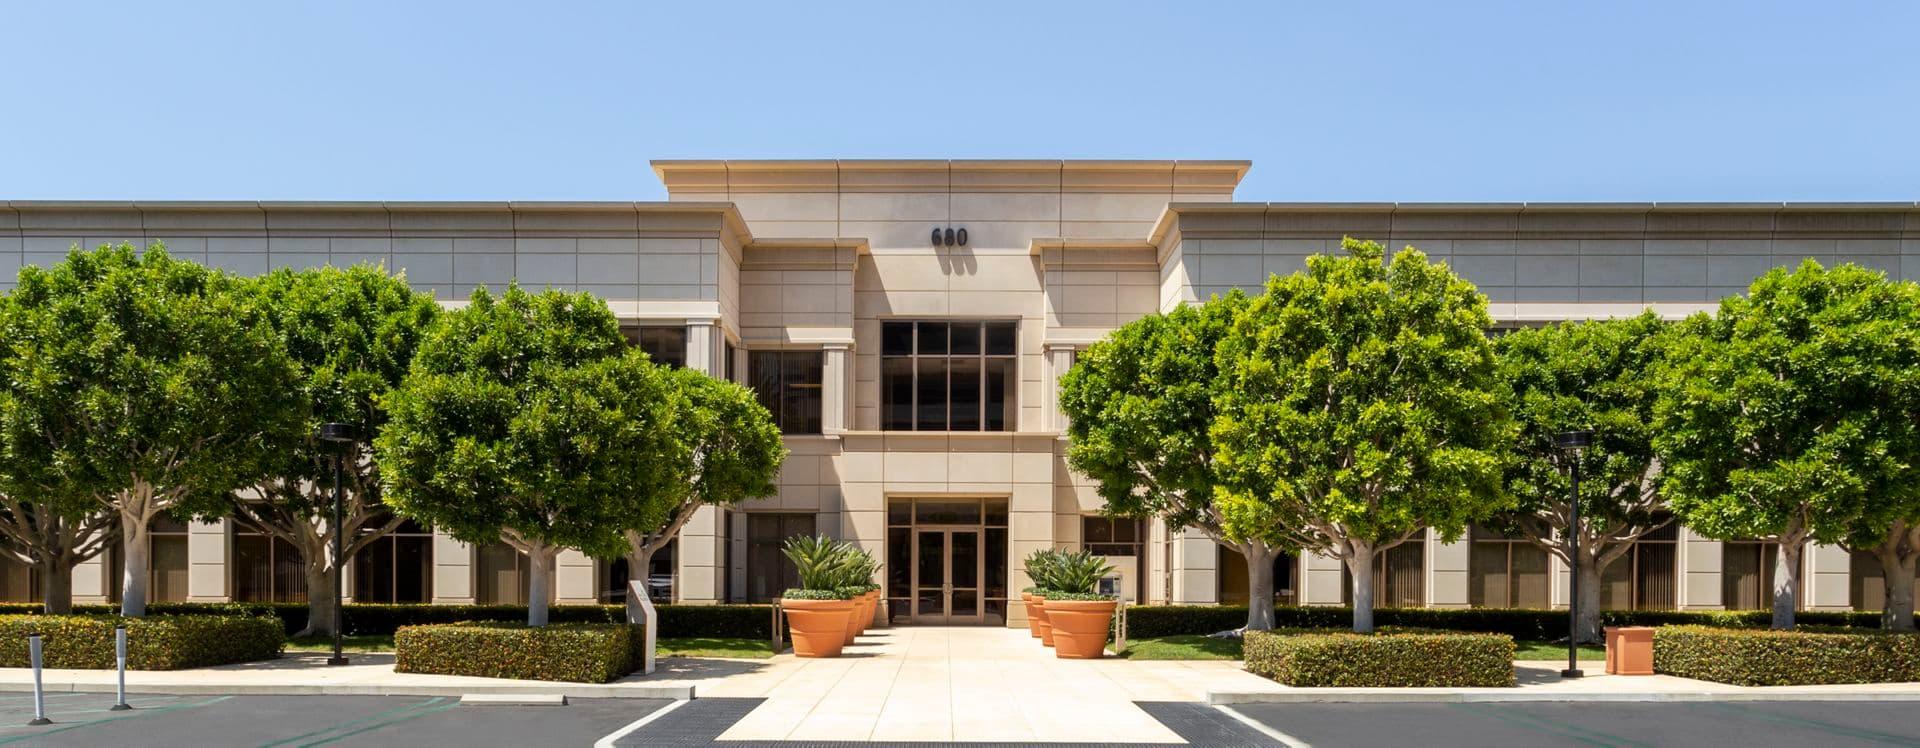 Exterior building photography of 680 Newport Center Drive, Newport Beach, CA